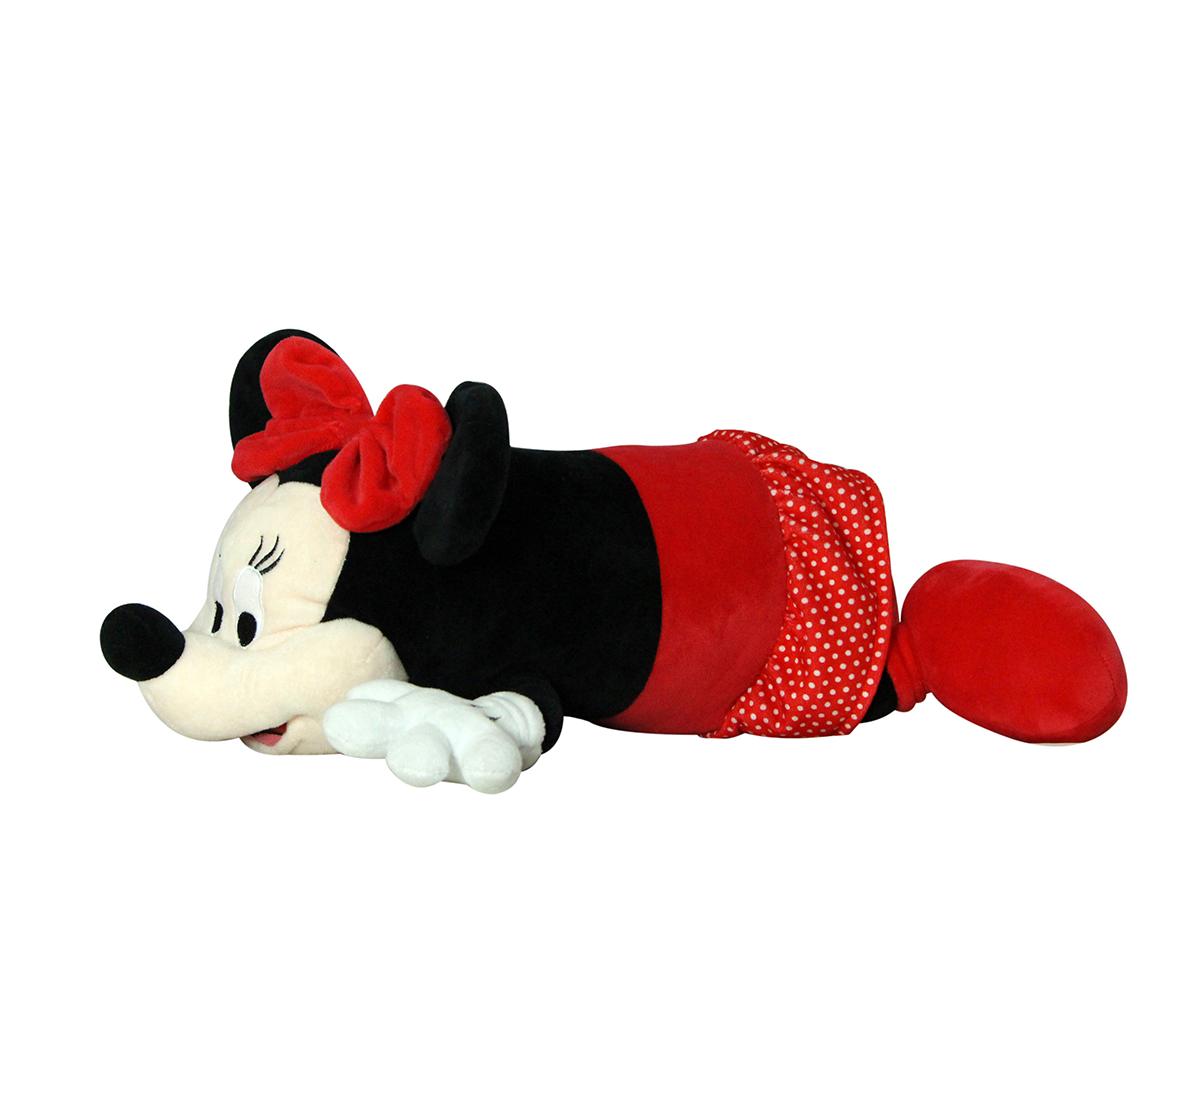 Disney | Disney Minnie Bolster Plush Accessories for Kids age 12M+ - 16.5 Cm